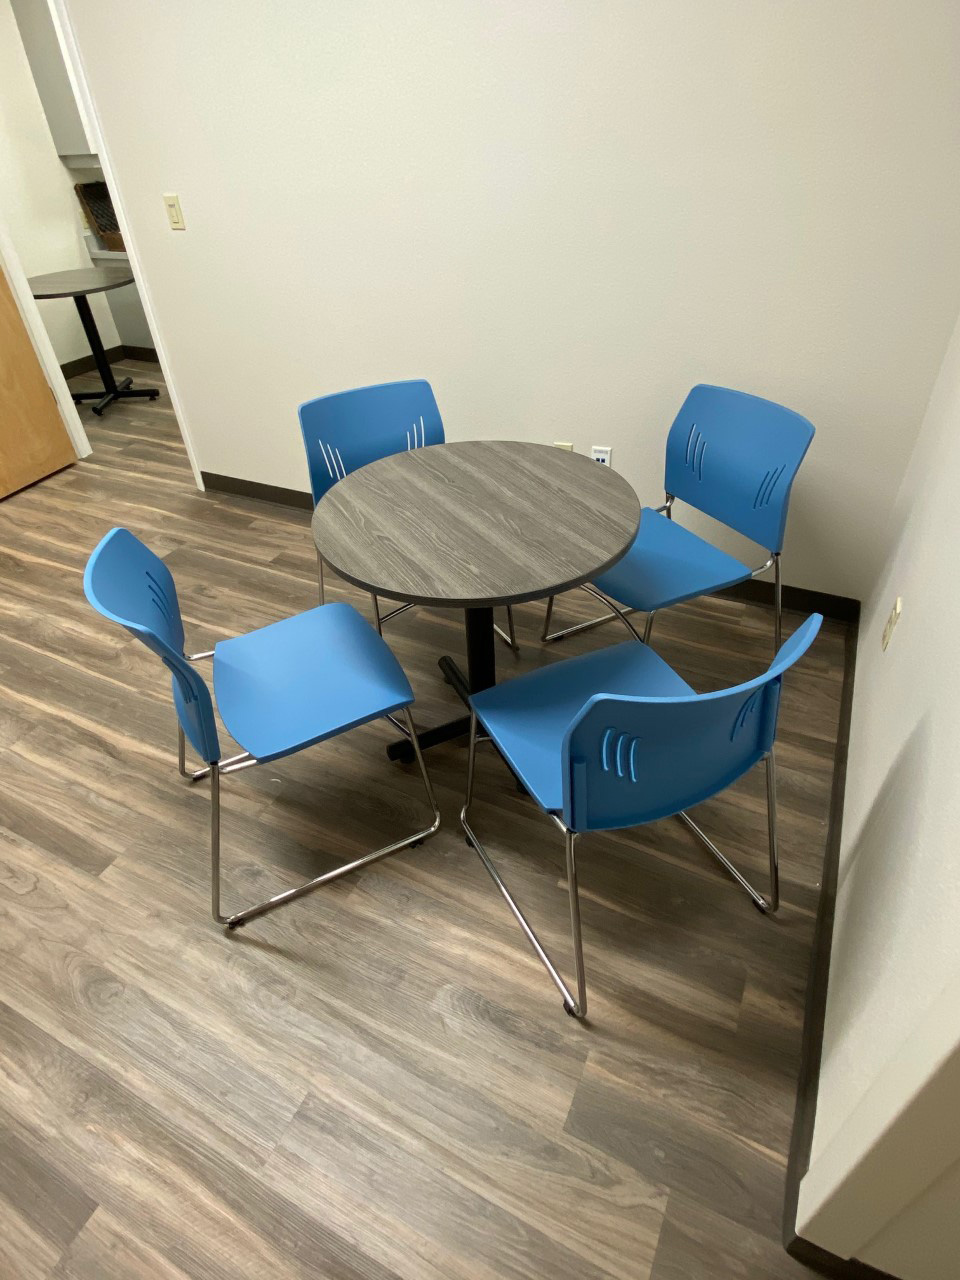 furniture-office-supplies-in-bradenton-florida-3-1.jpg